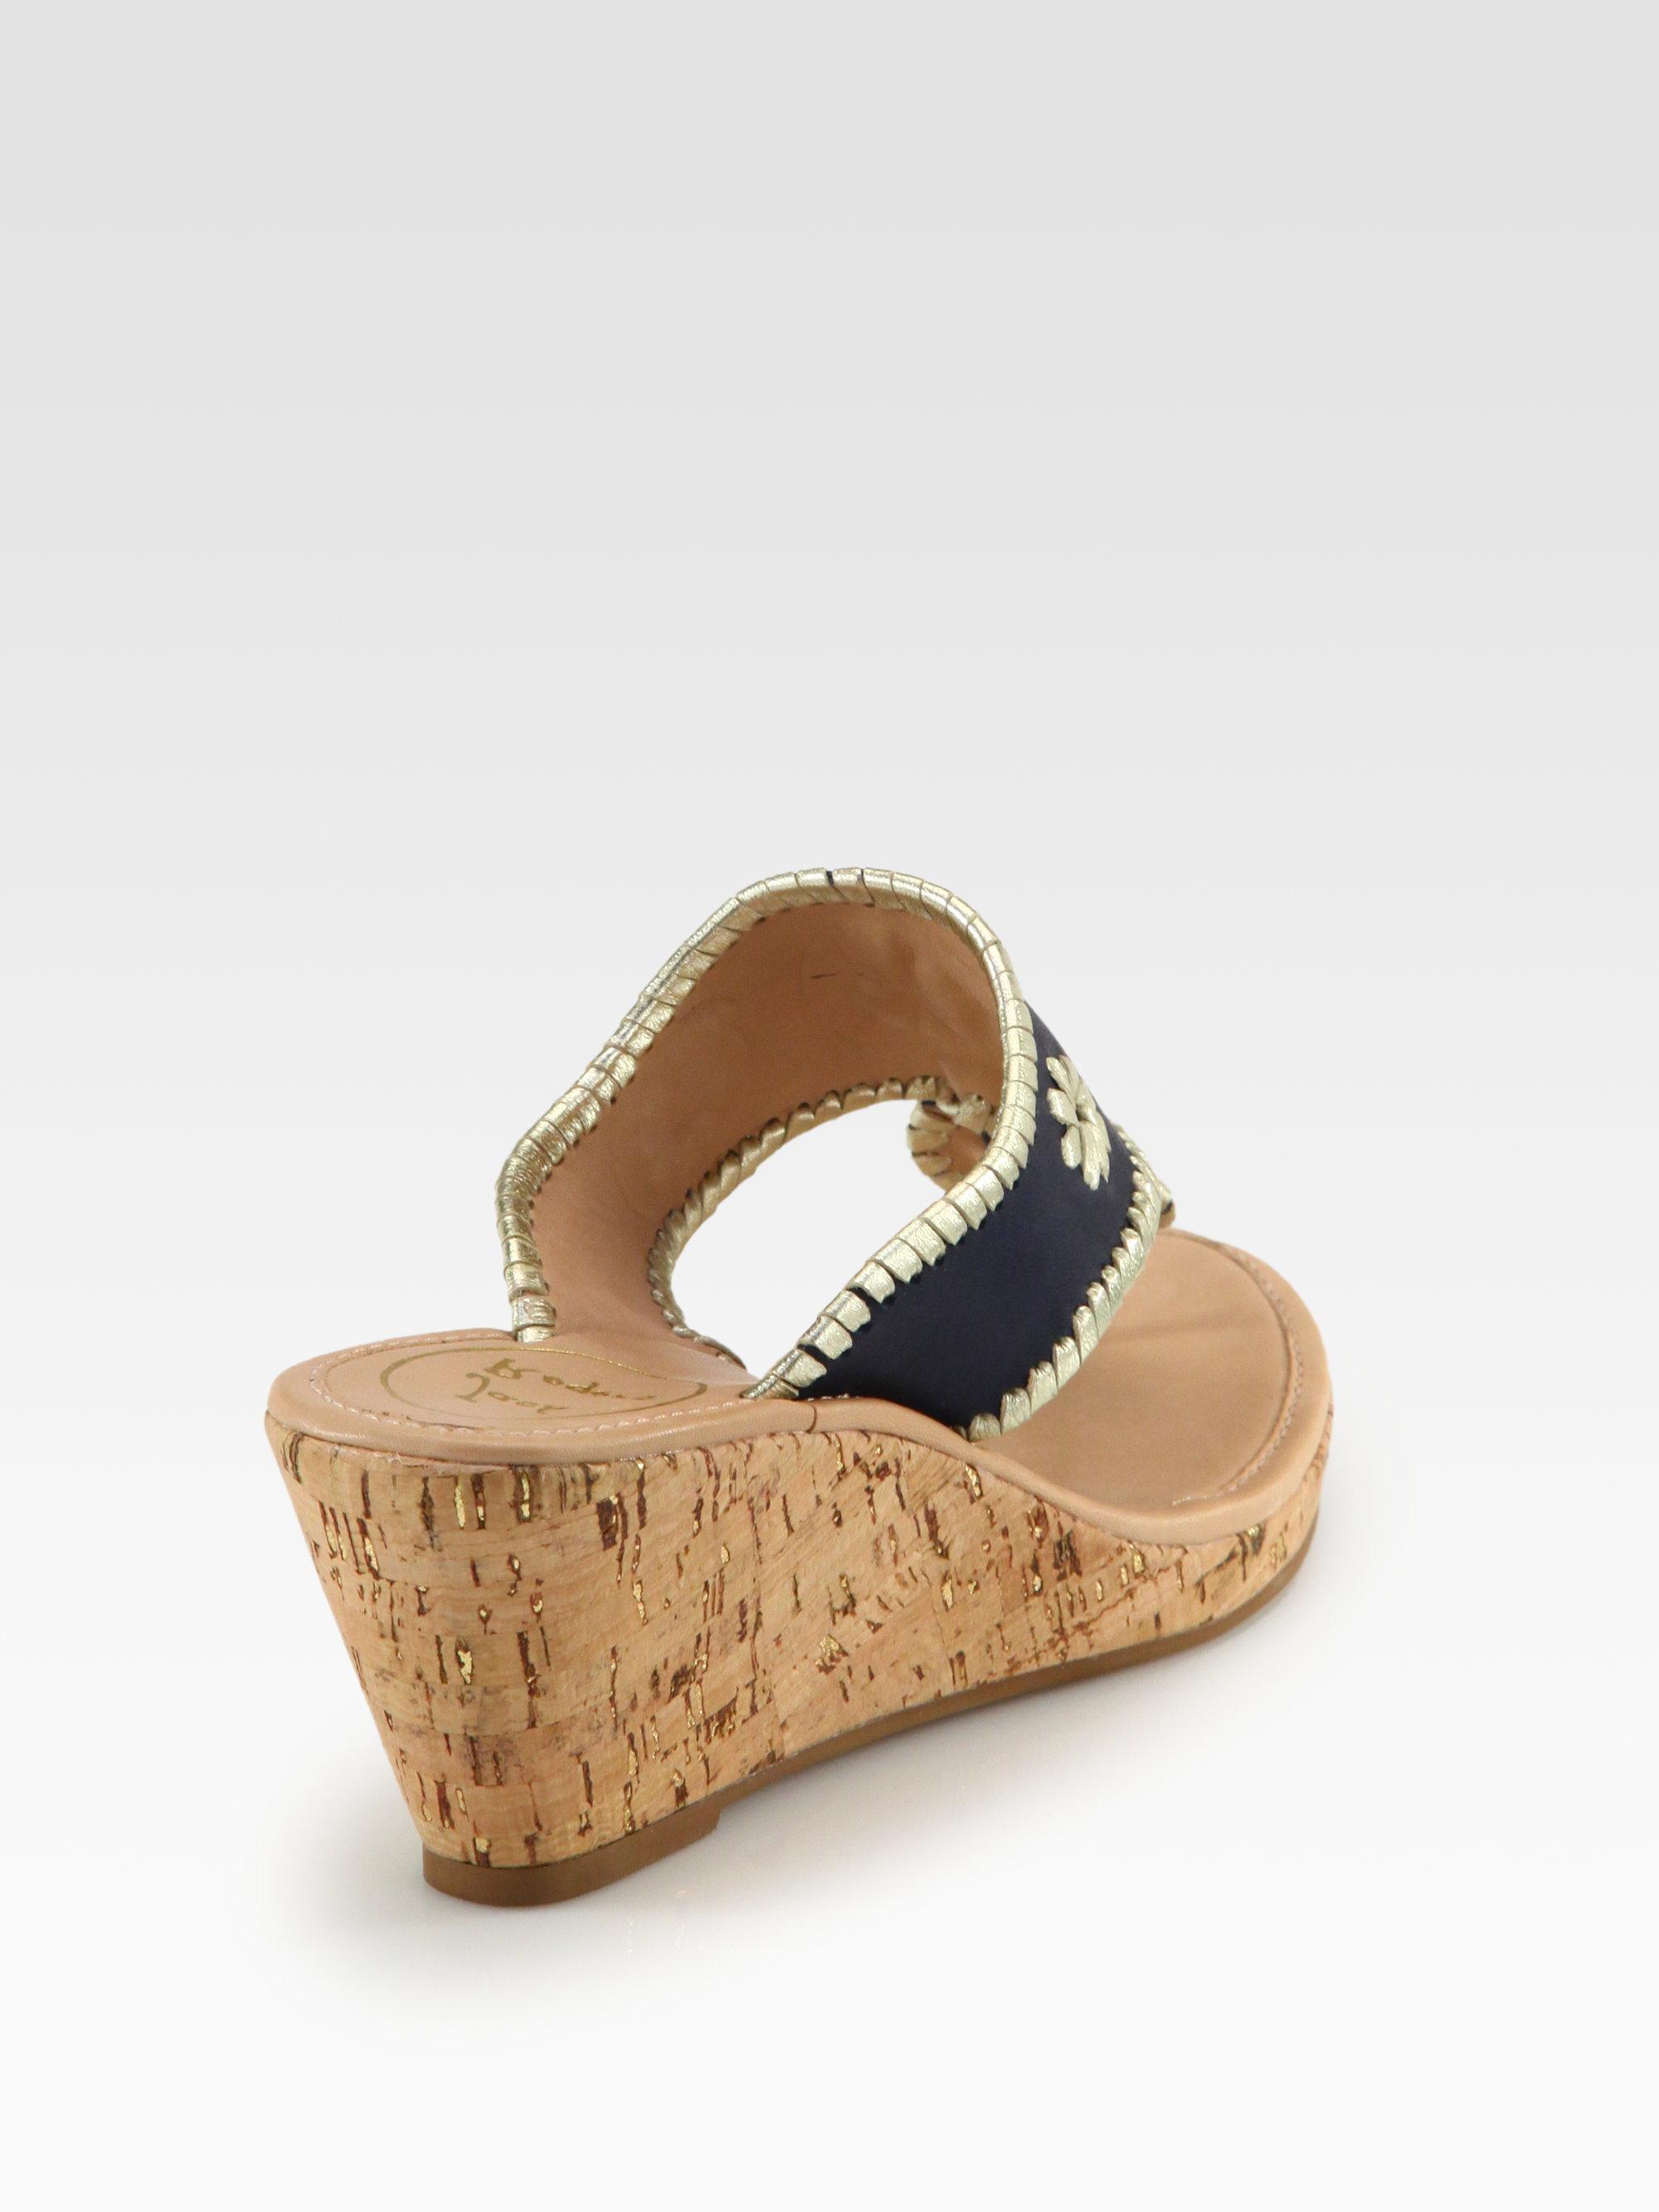 cdd9974bc10 Jack Rogers Marbella Metallic Leather Cork Wedge Sandals in Black - Lyst